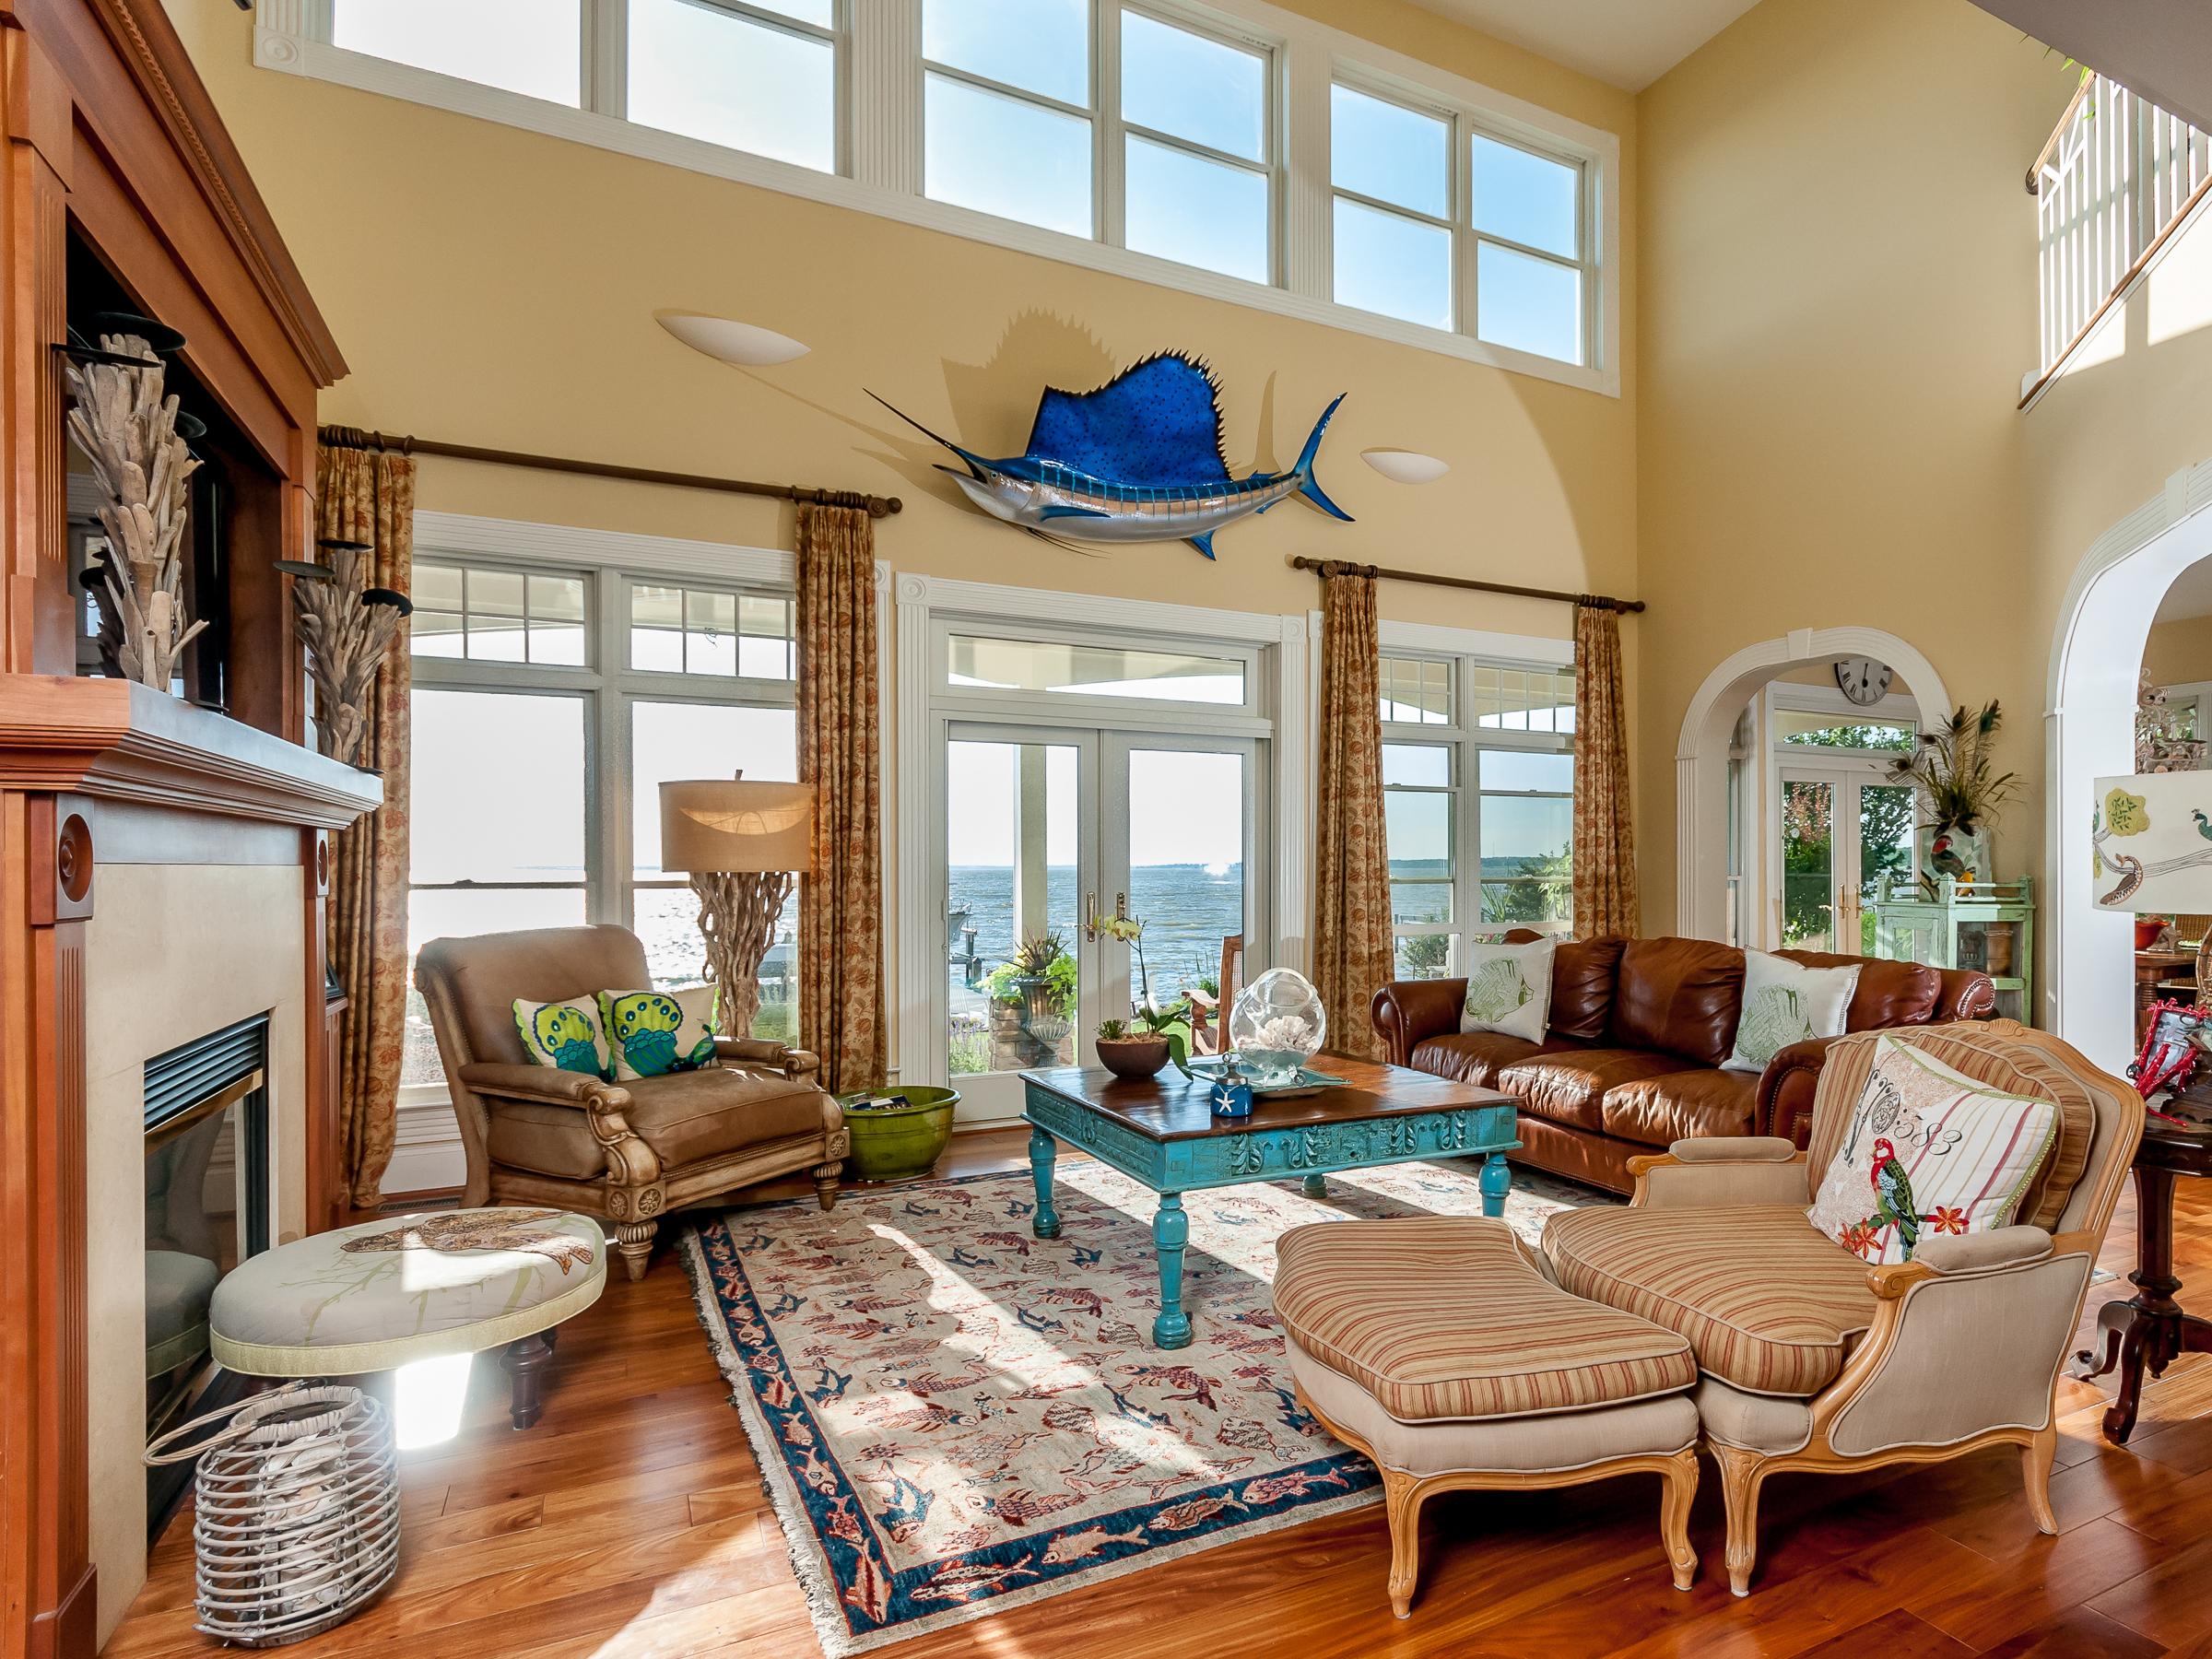 Beautiful views, real estate photography